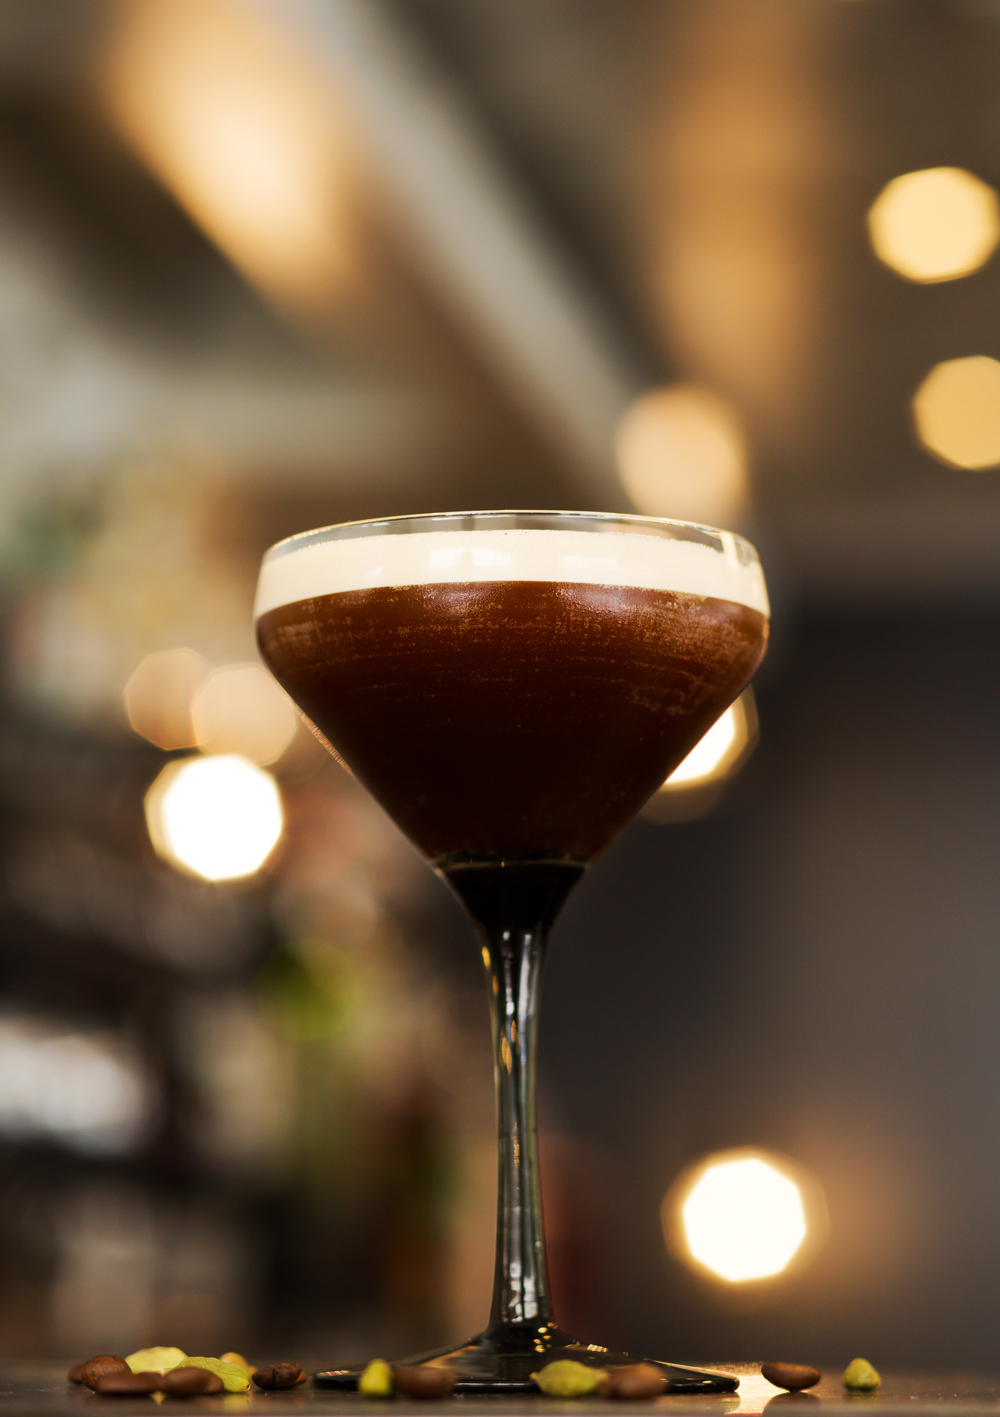 EspressoMartini2.jpg